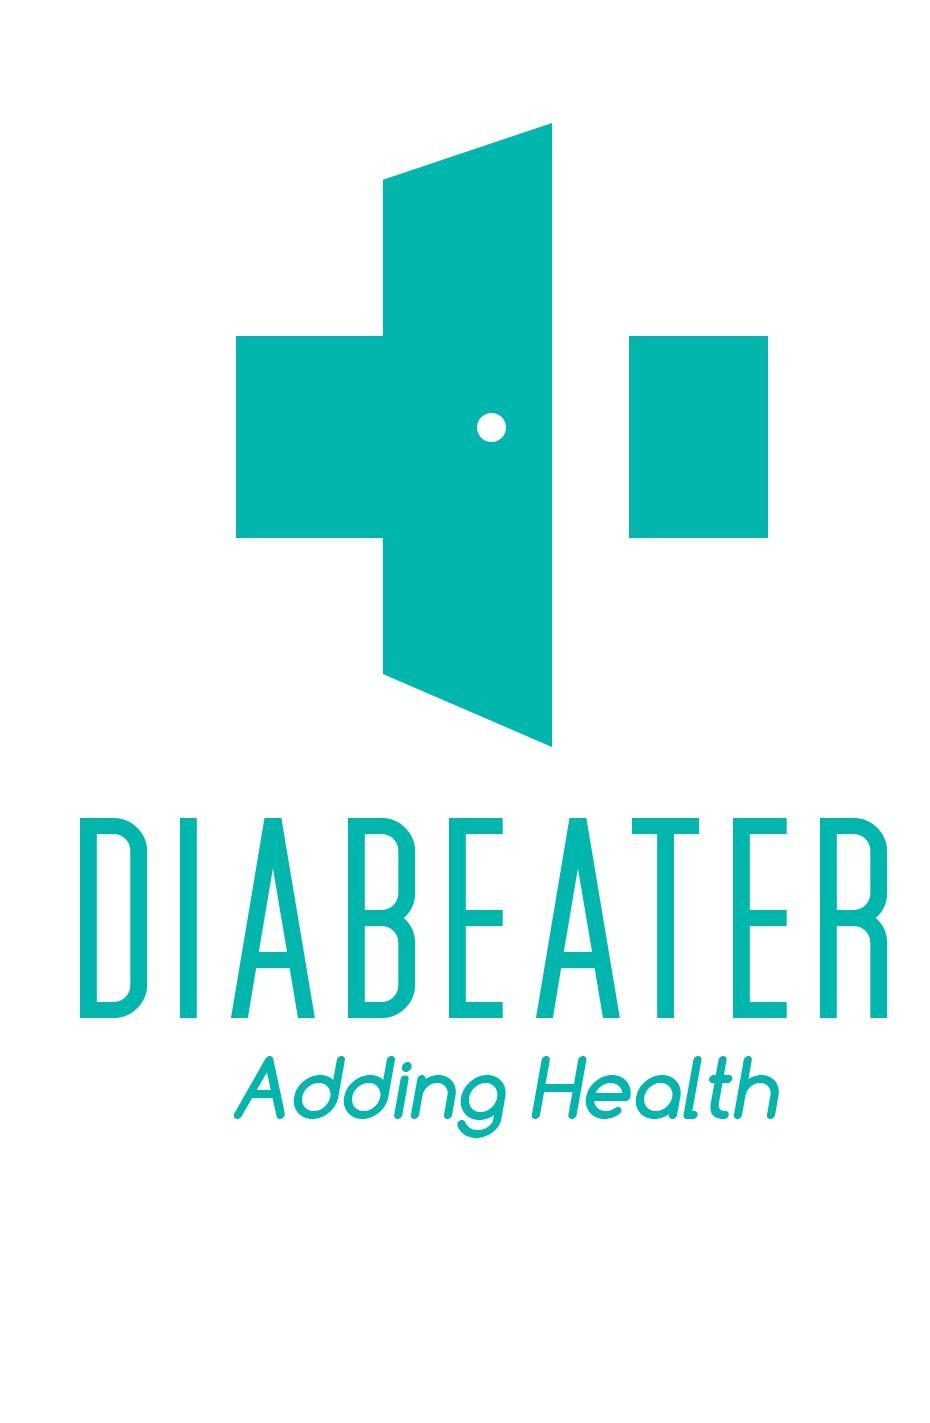 Diabeater